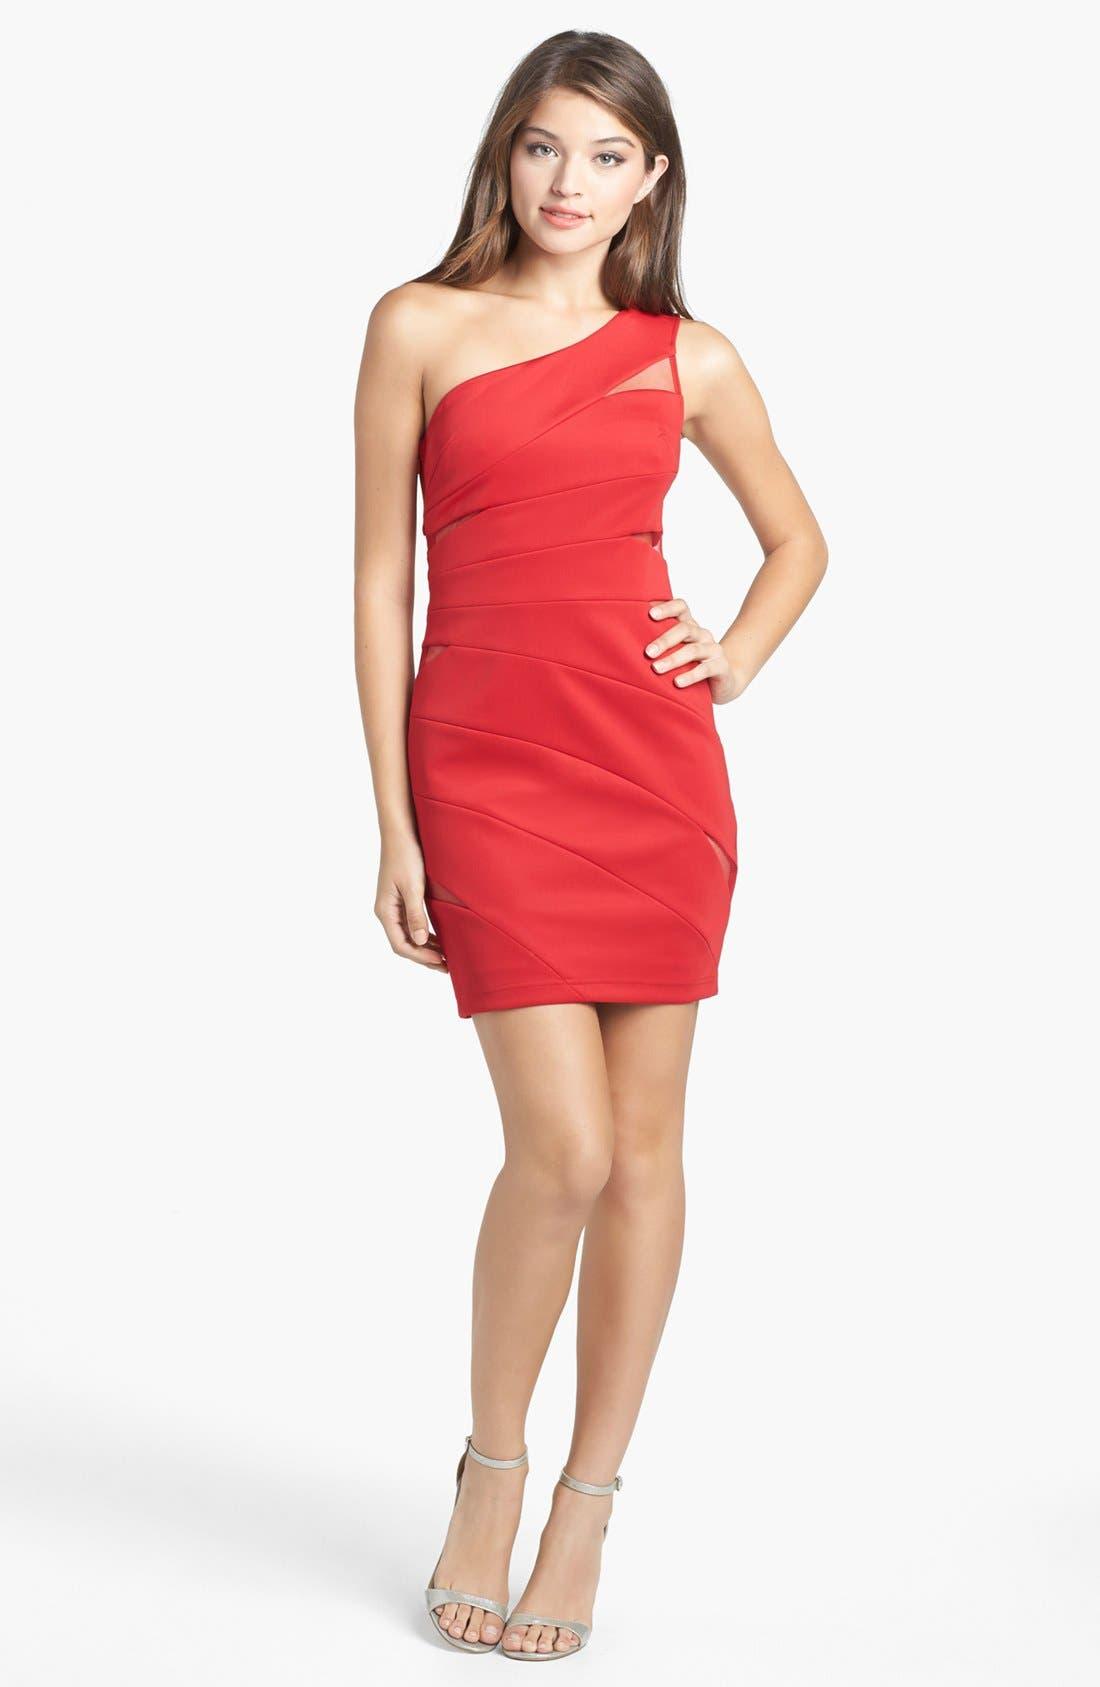 Alternate Image 1 Selected - Hailey Logan Mesh Inset One-Shoulder Body-Con Dress (Juniors)